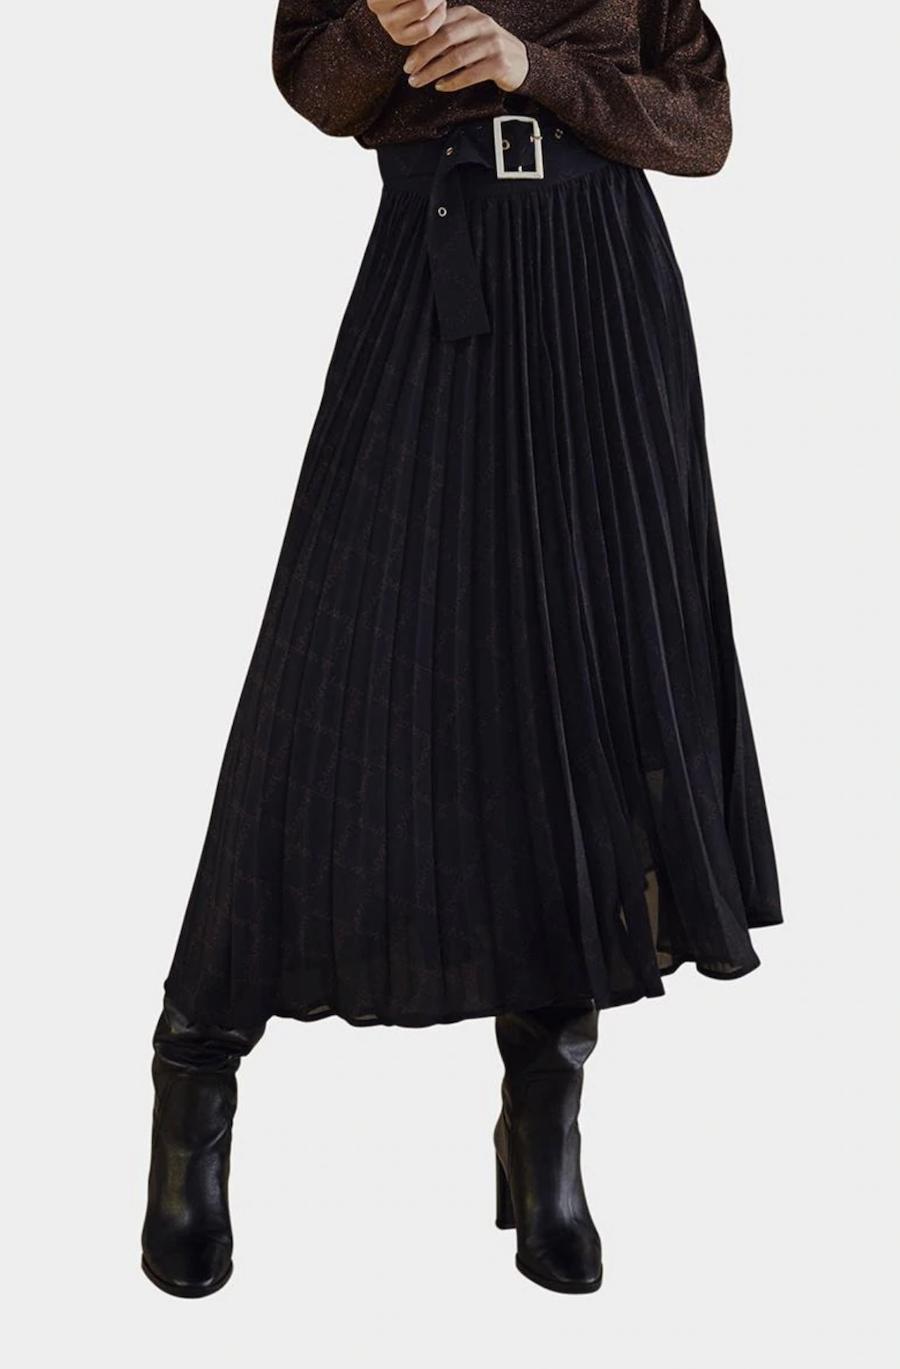 Falda larga plisada con estampado monogram